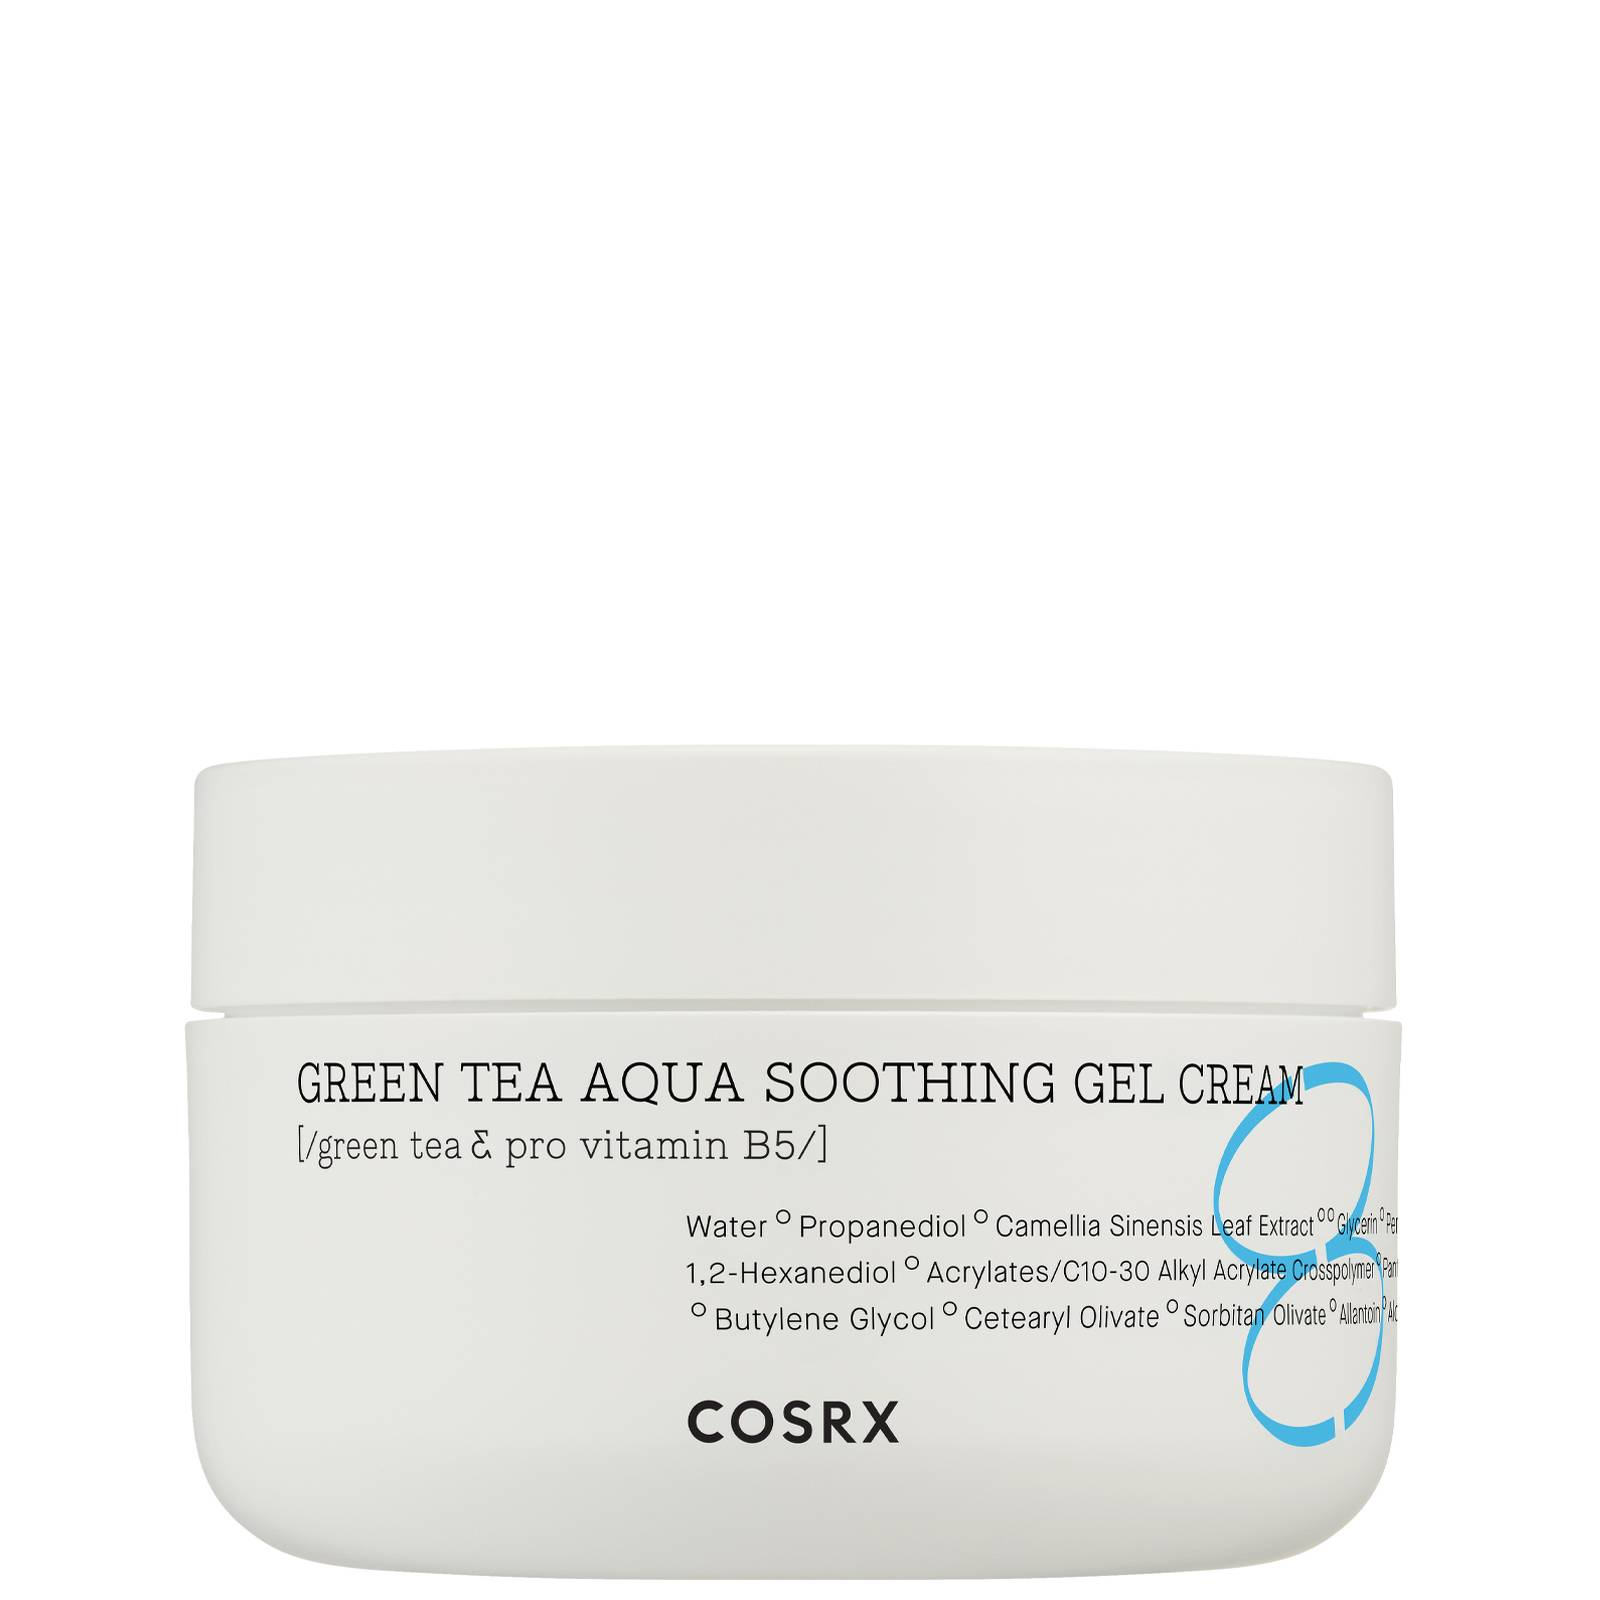 Cosrx Moisturizer Hydrium verde Tè Aqua Lenorimento Gel Crema 50ml